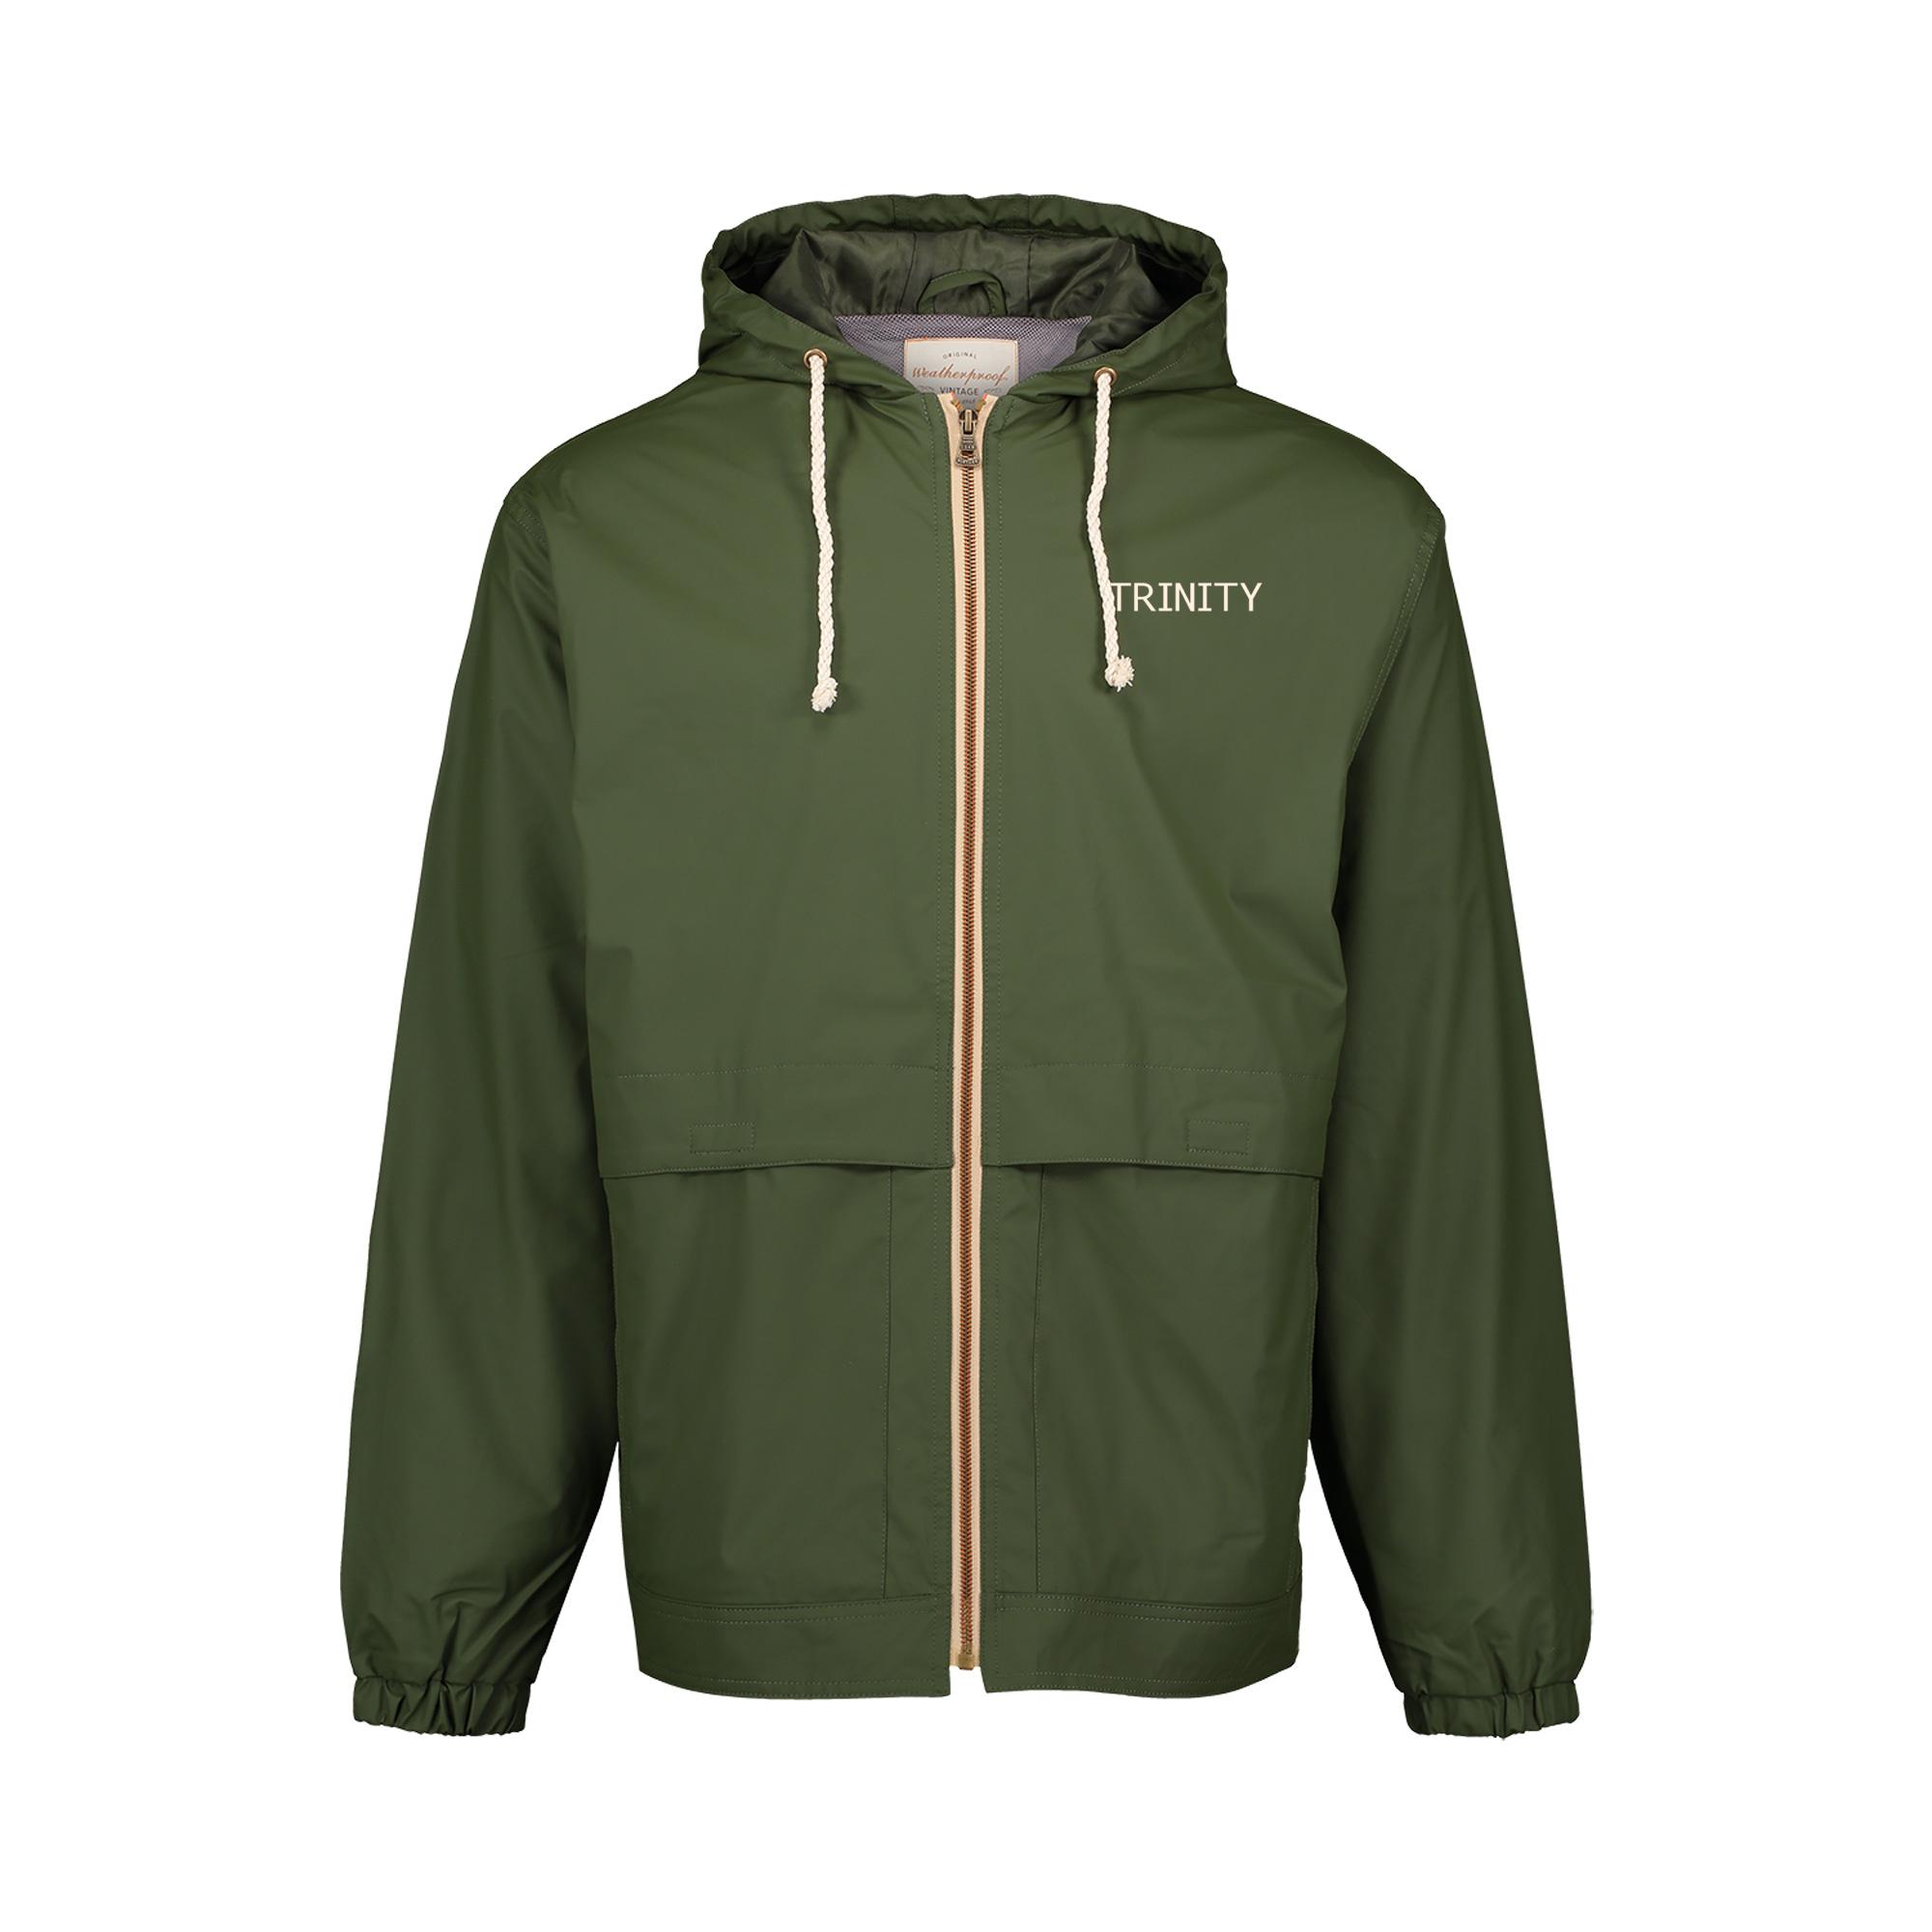 MV Sports Vintage Hooded Rain Jacket Green